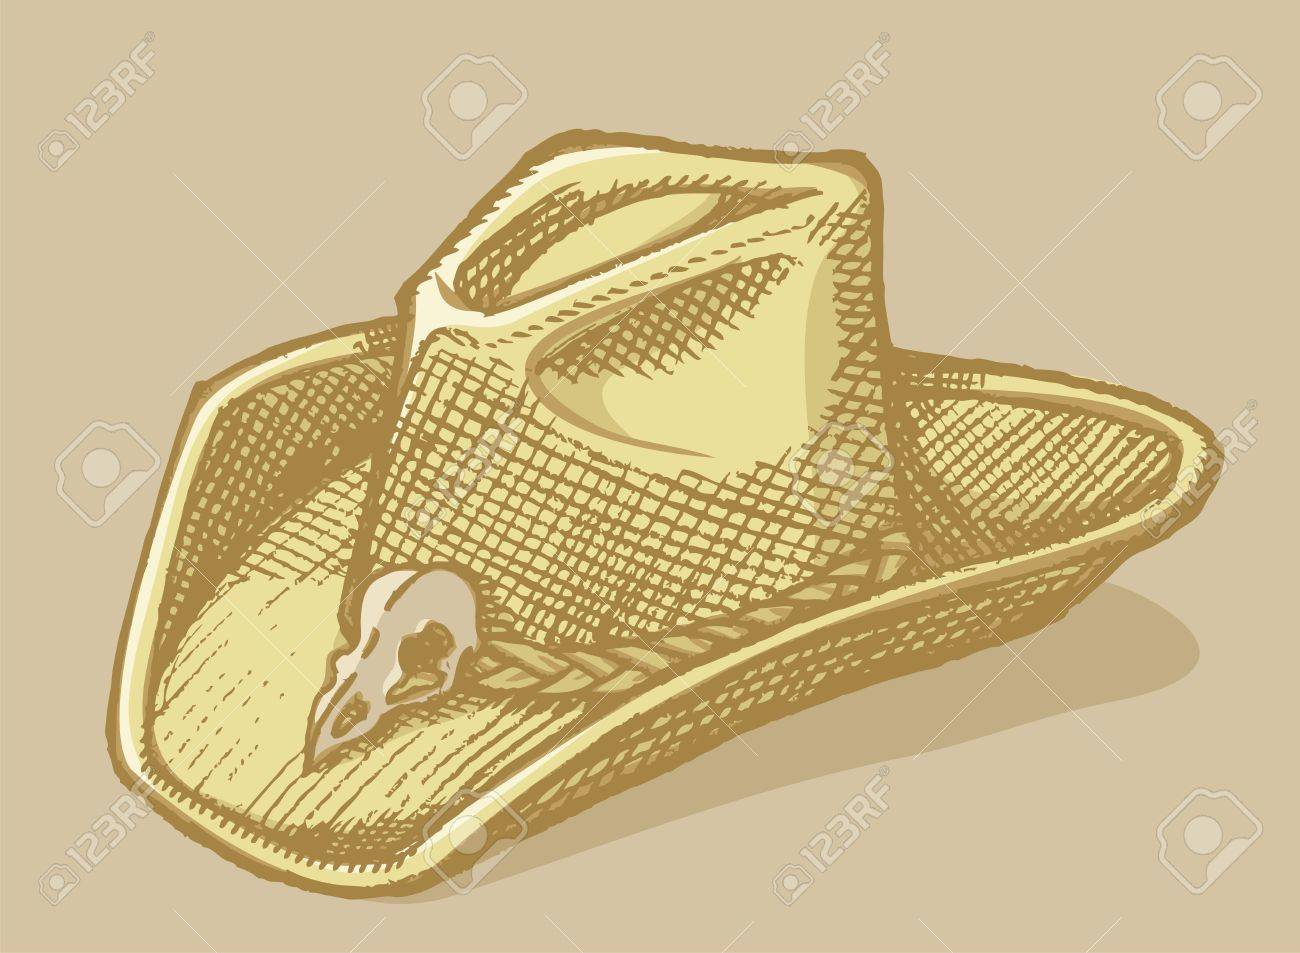 hat sketch with bird scull on beige background. - 19612101